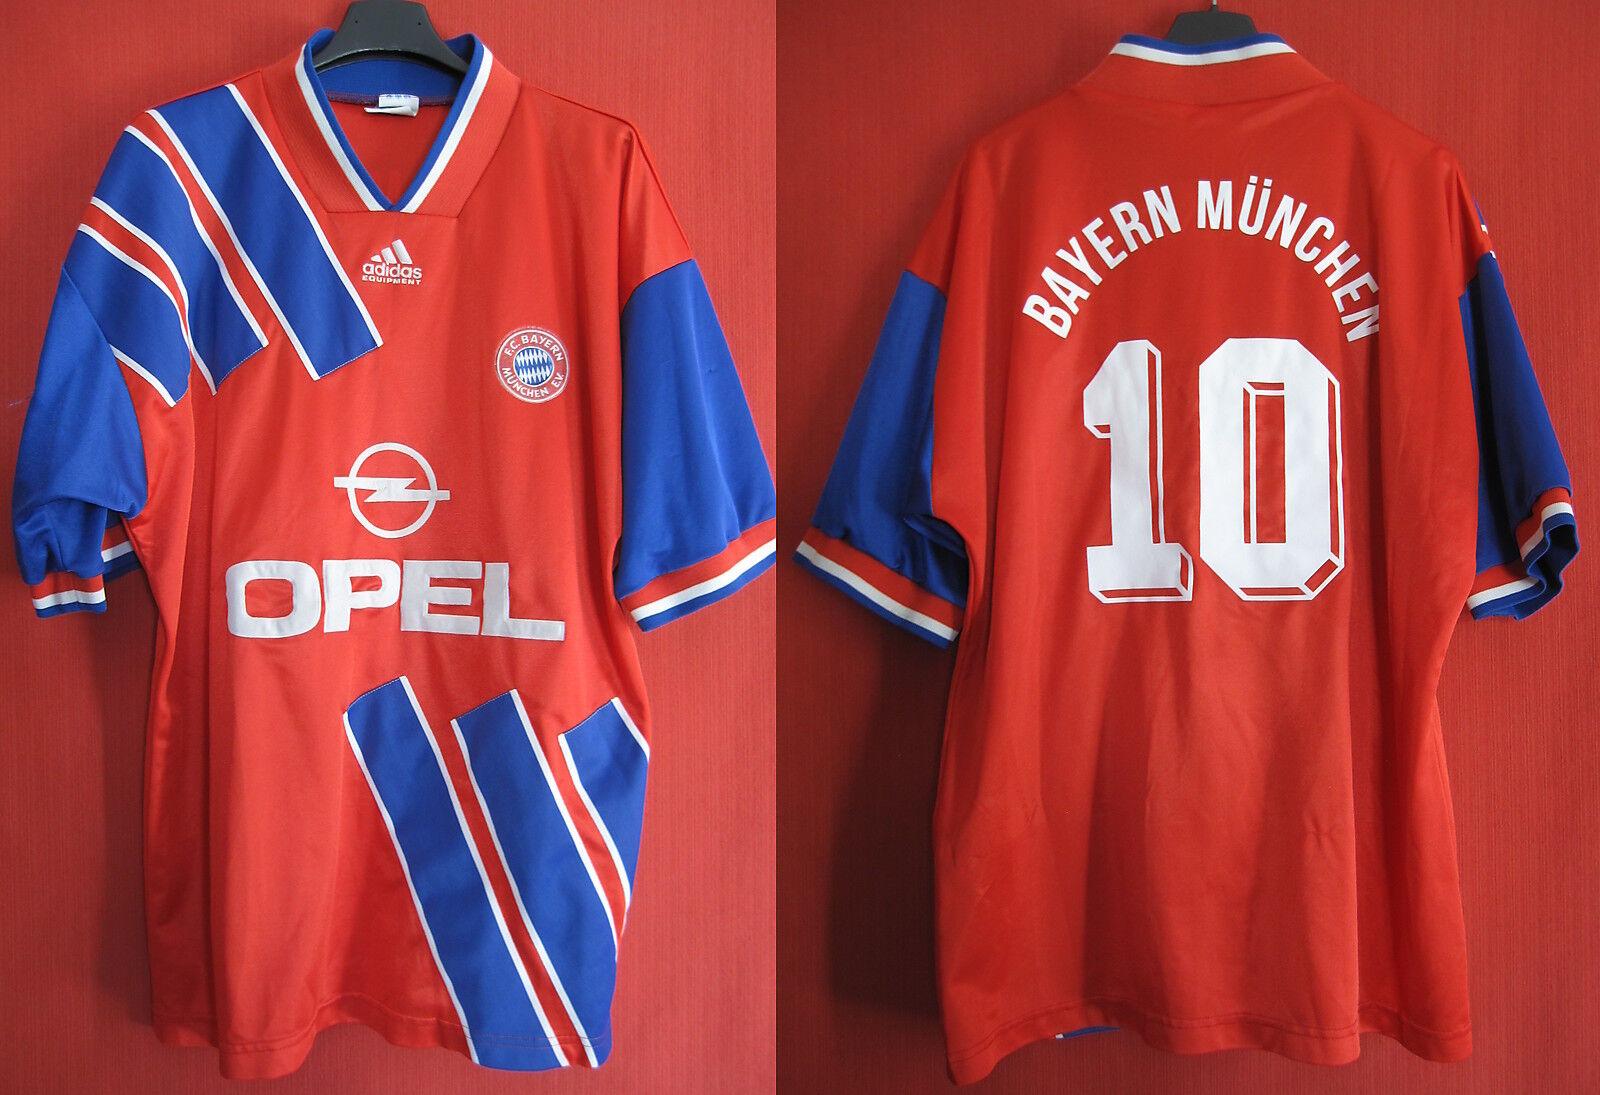 Maillot Adidas Fc Bayern n°10 Munchen Opel Matthaus n°10 Bayern Ancien - L 7ea193